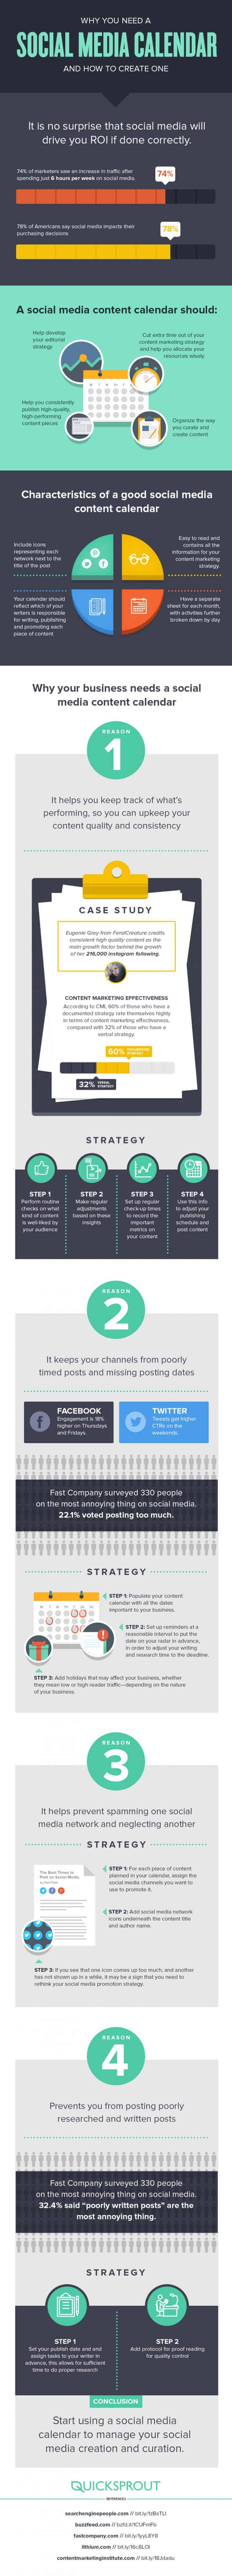 social-media-calendar-infographic